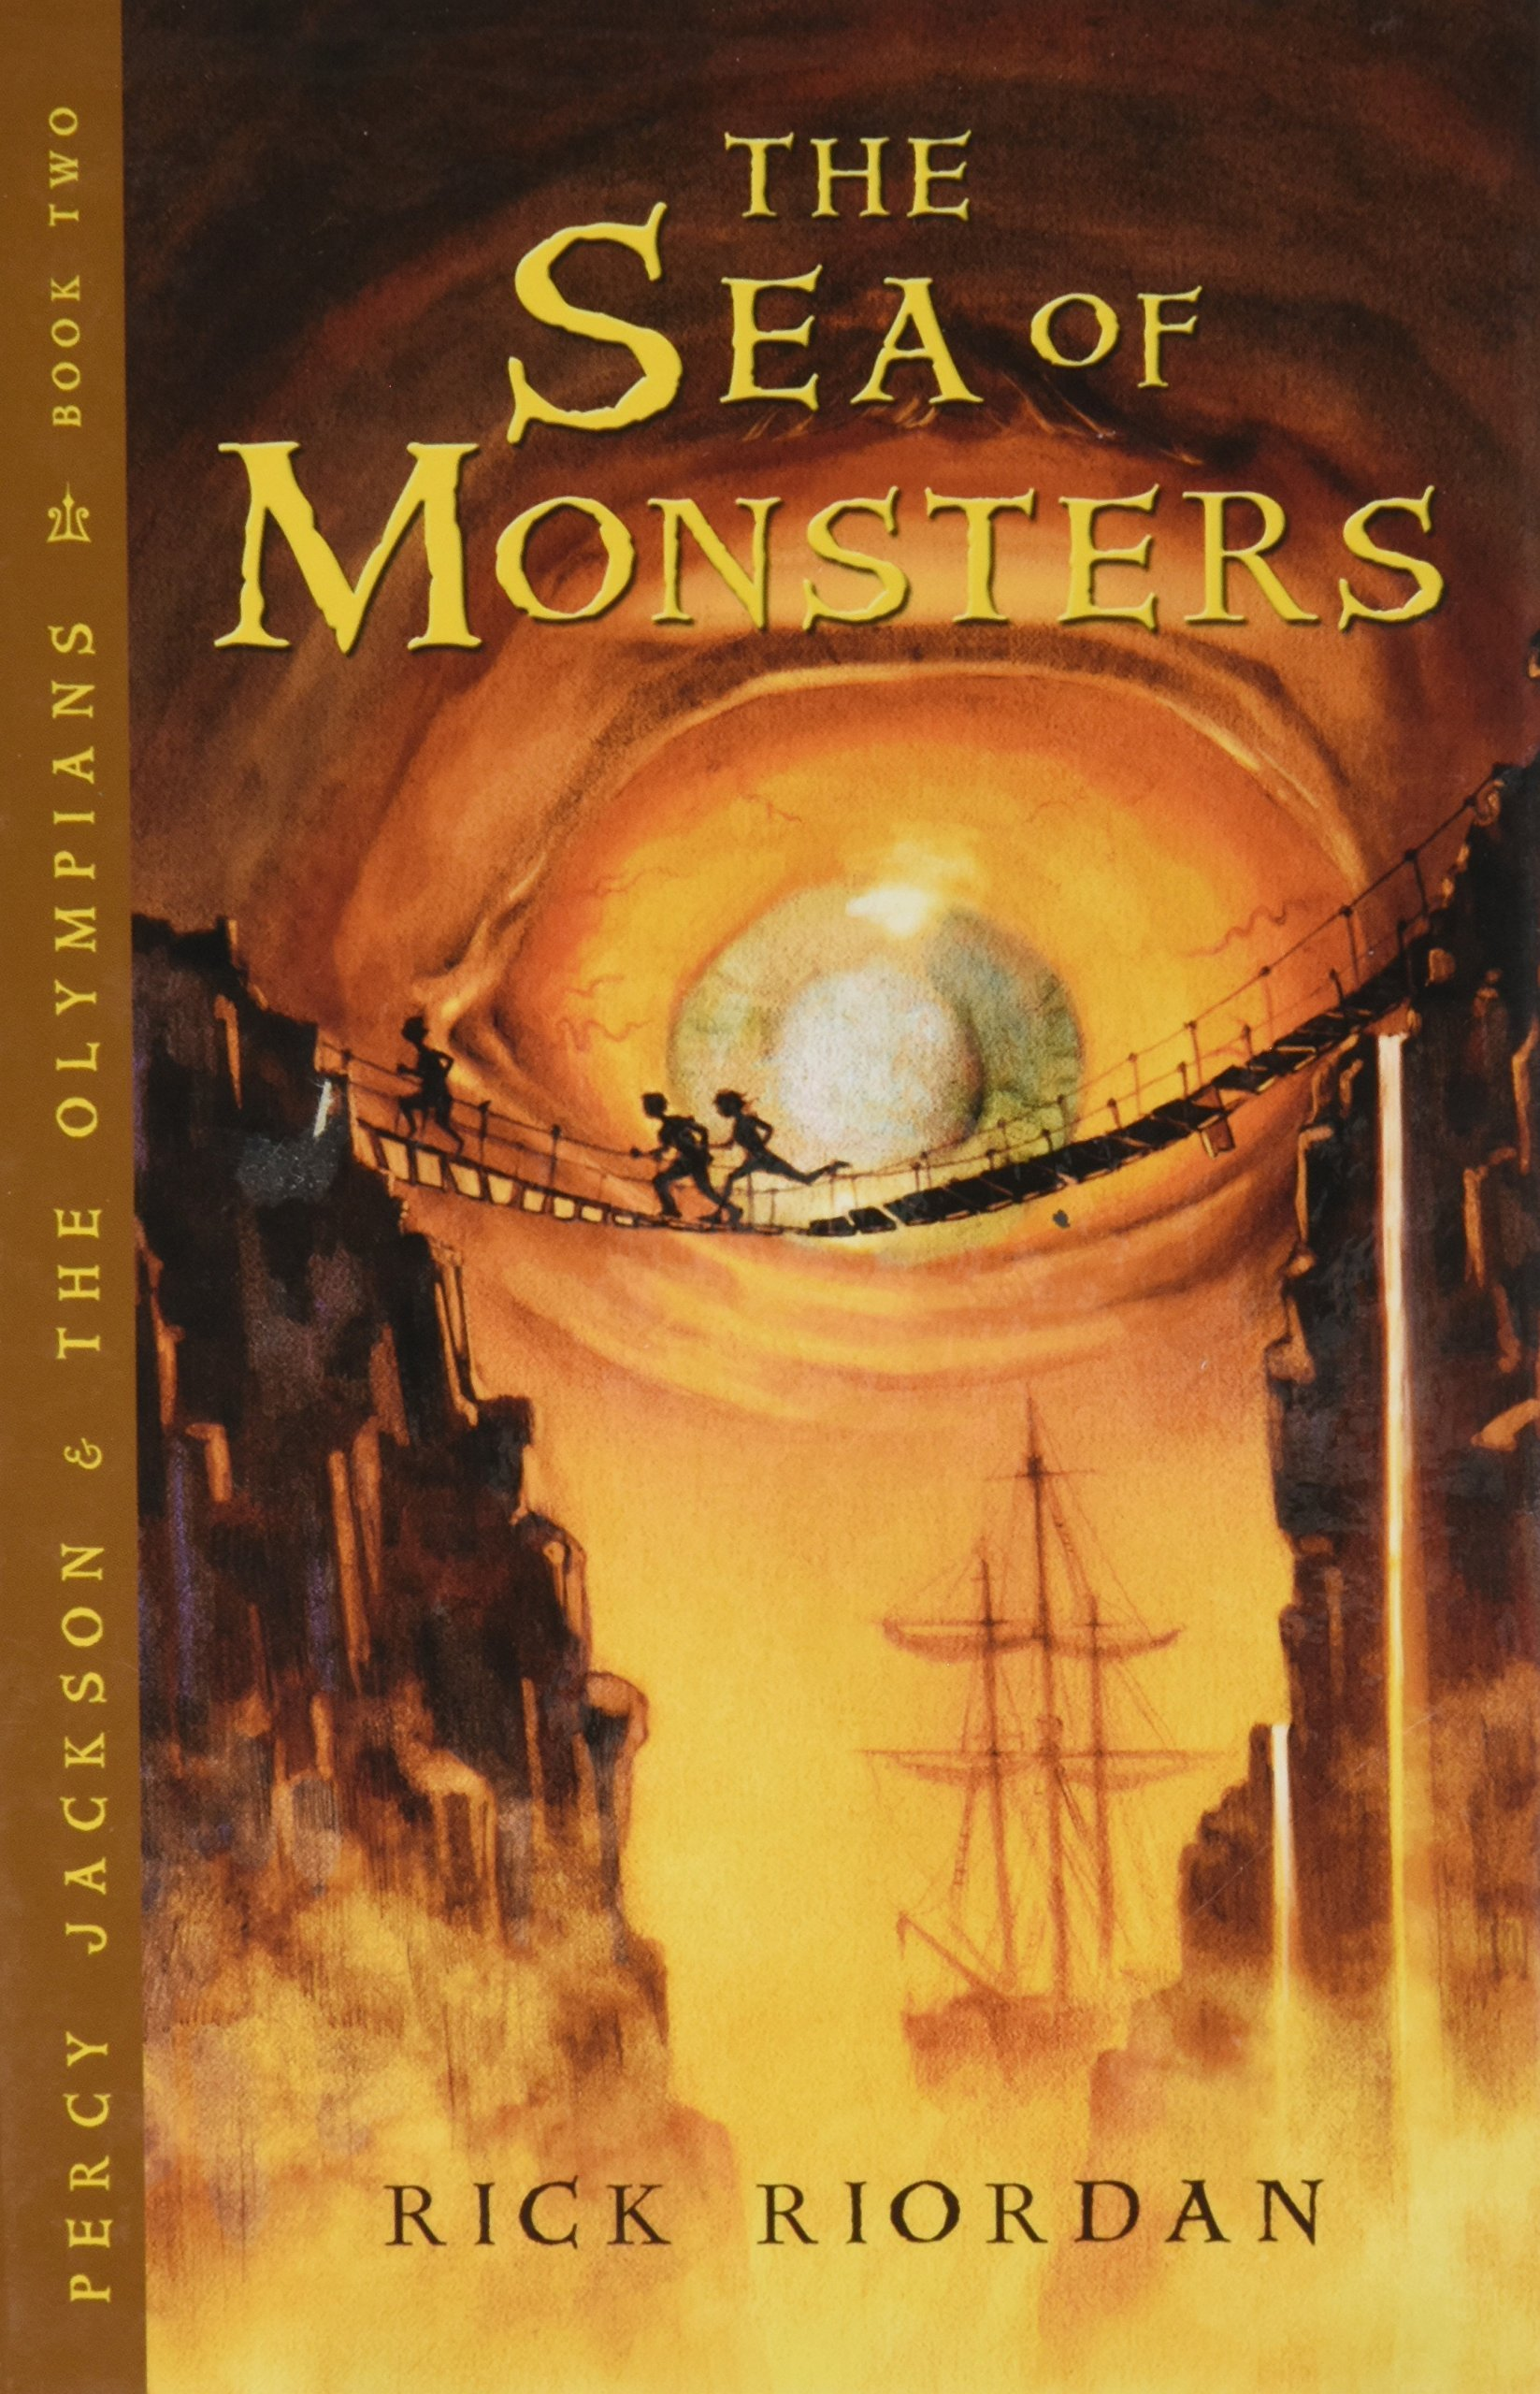 The Sea of Monsters: 2 Percy Jackson and the Olympians - Thorndike Press Large Print The Literacy Bridge Young Adult: Amazon.es: Riordan, Rick: Libros en idiomas extranjeros